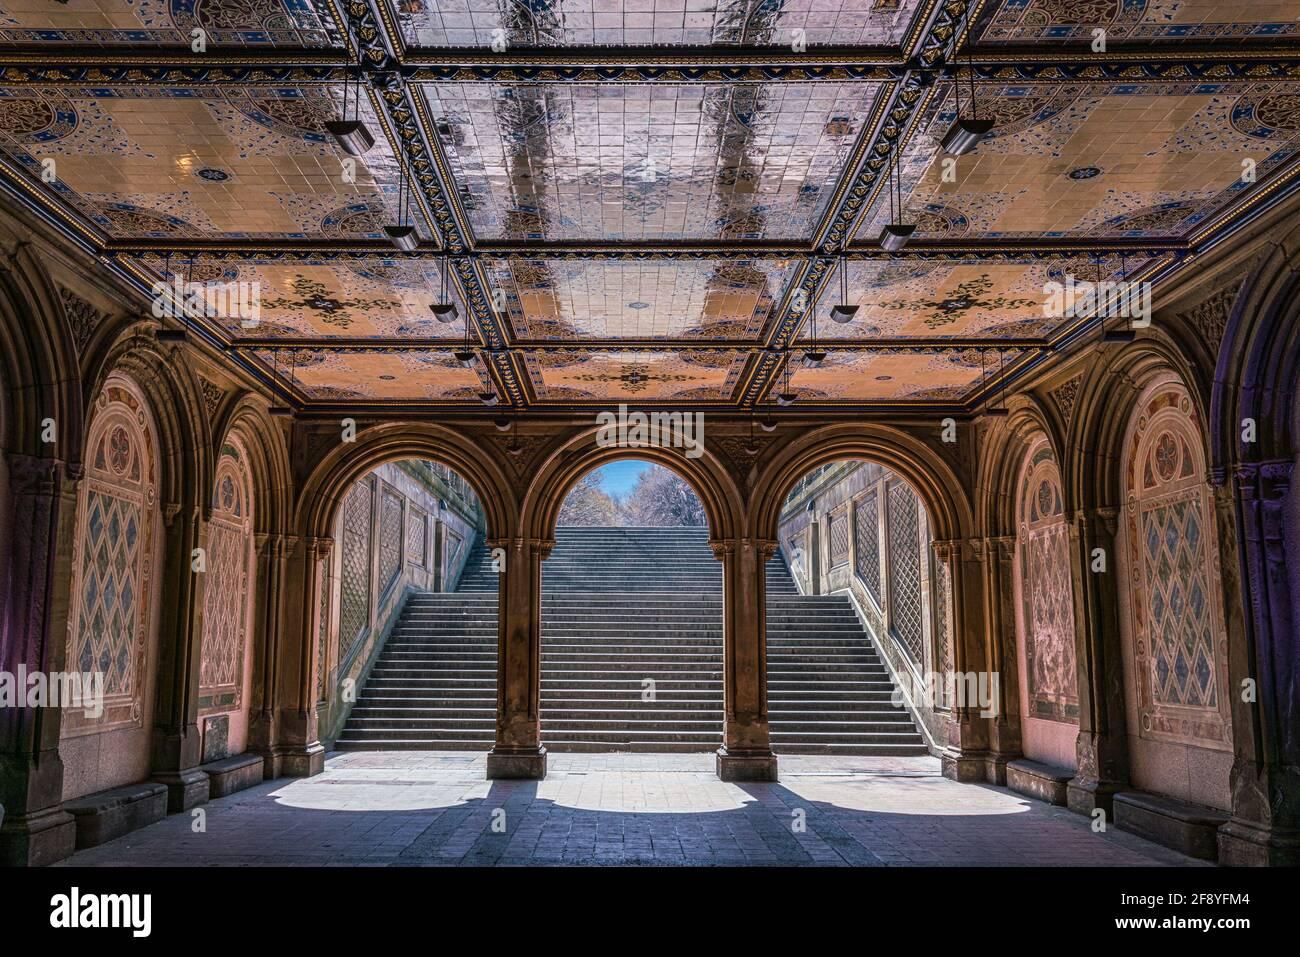 Bethesda Terrace, Central Park, New York City Stock Photo